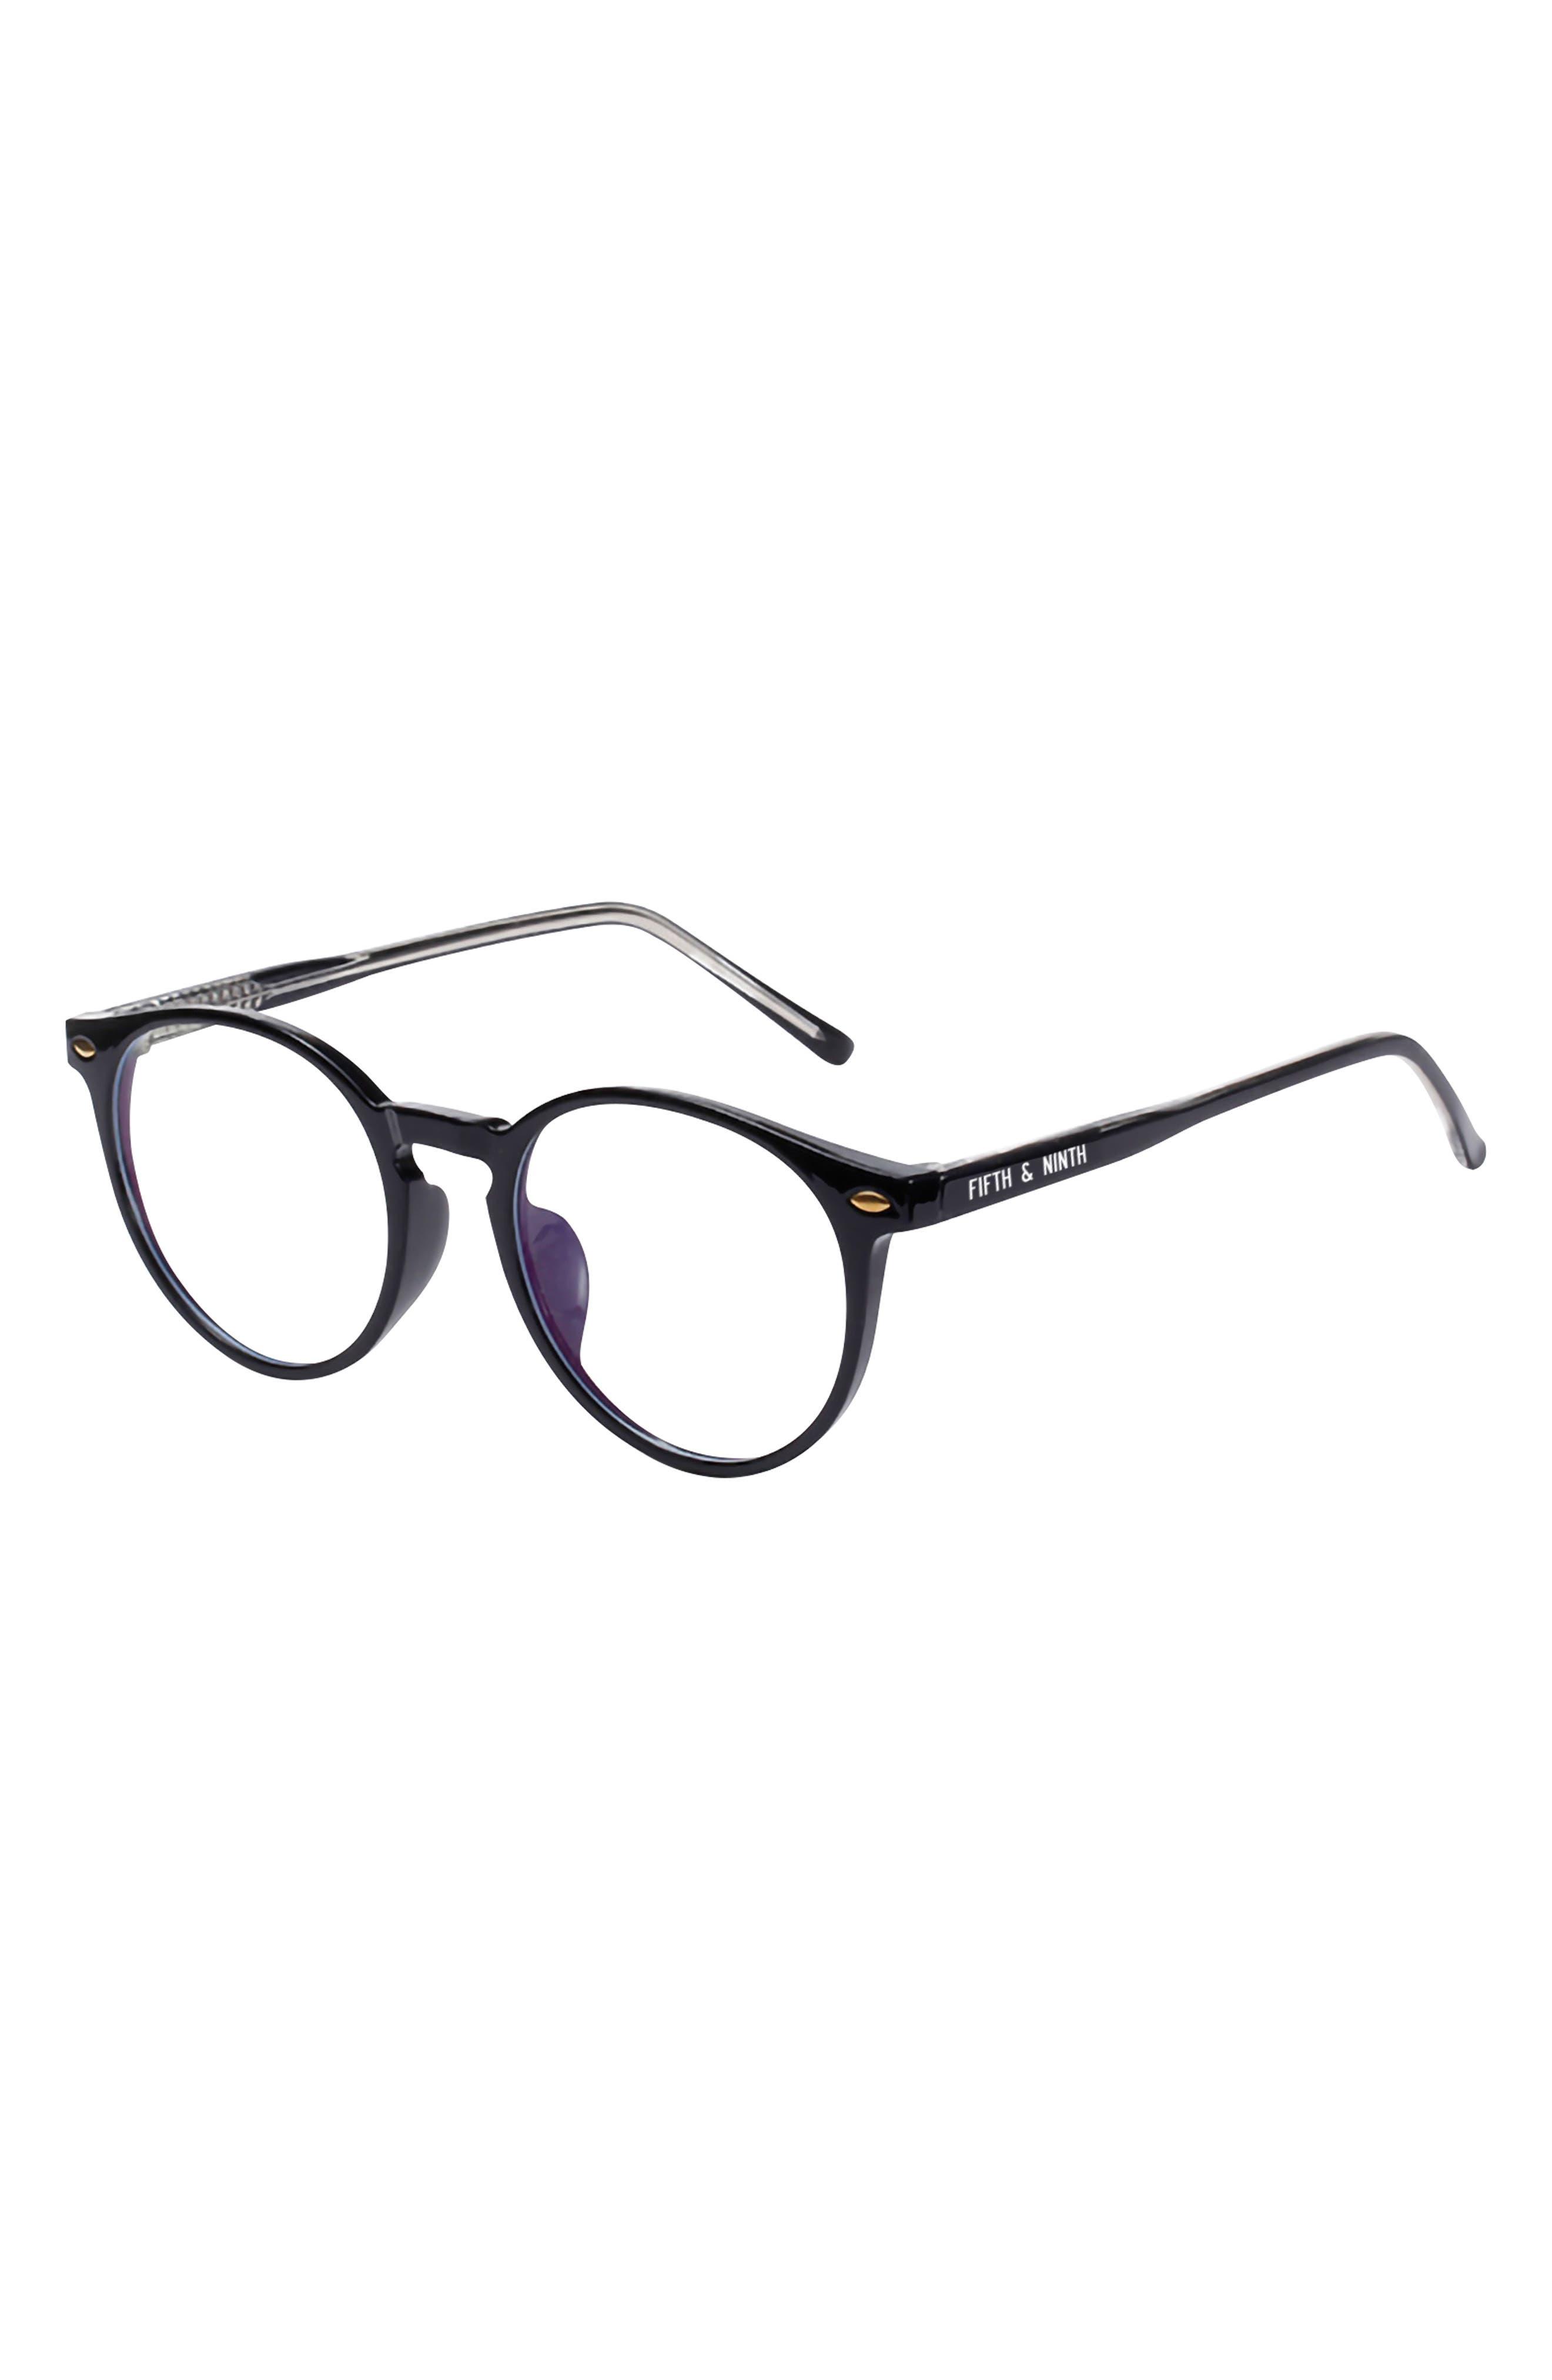 Chandler 46mm Blue Light Filtering Glasses